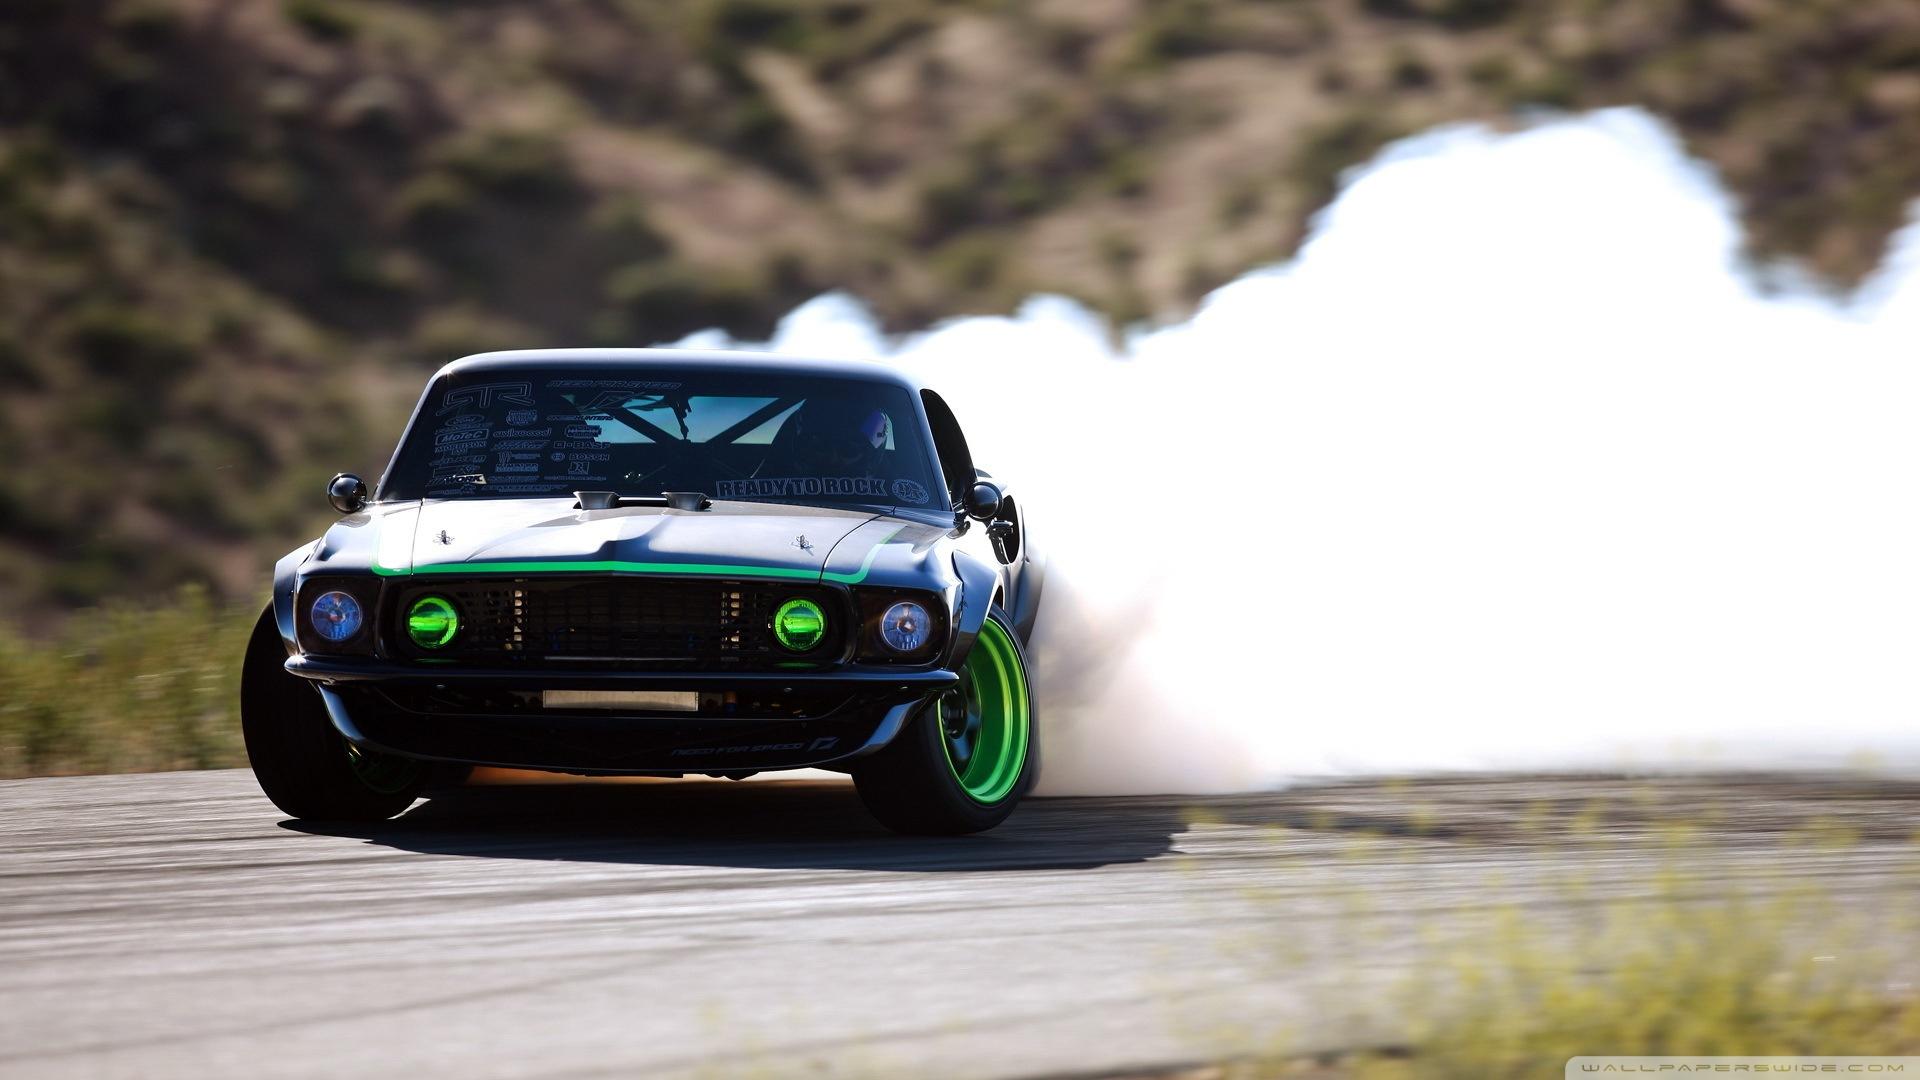 Cool Cars Drifting Wallpapers Hd Car Koenigsegg Agera R Wallpaper 1920x1200 16396